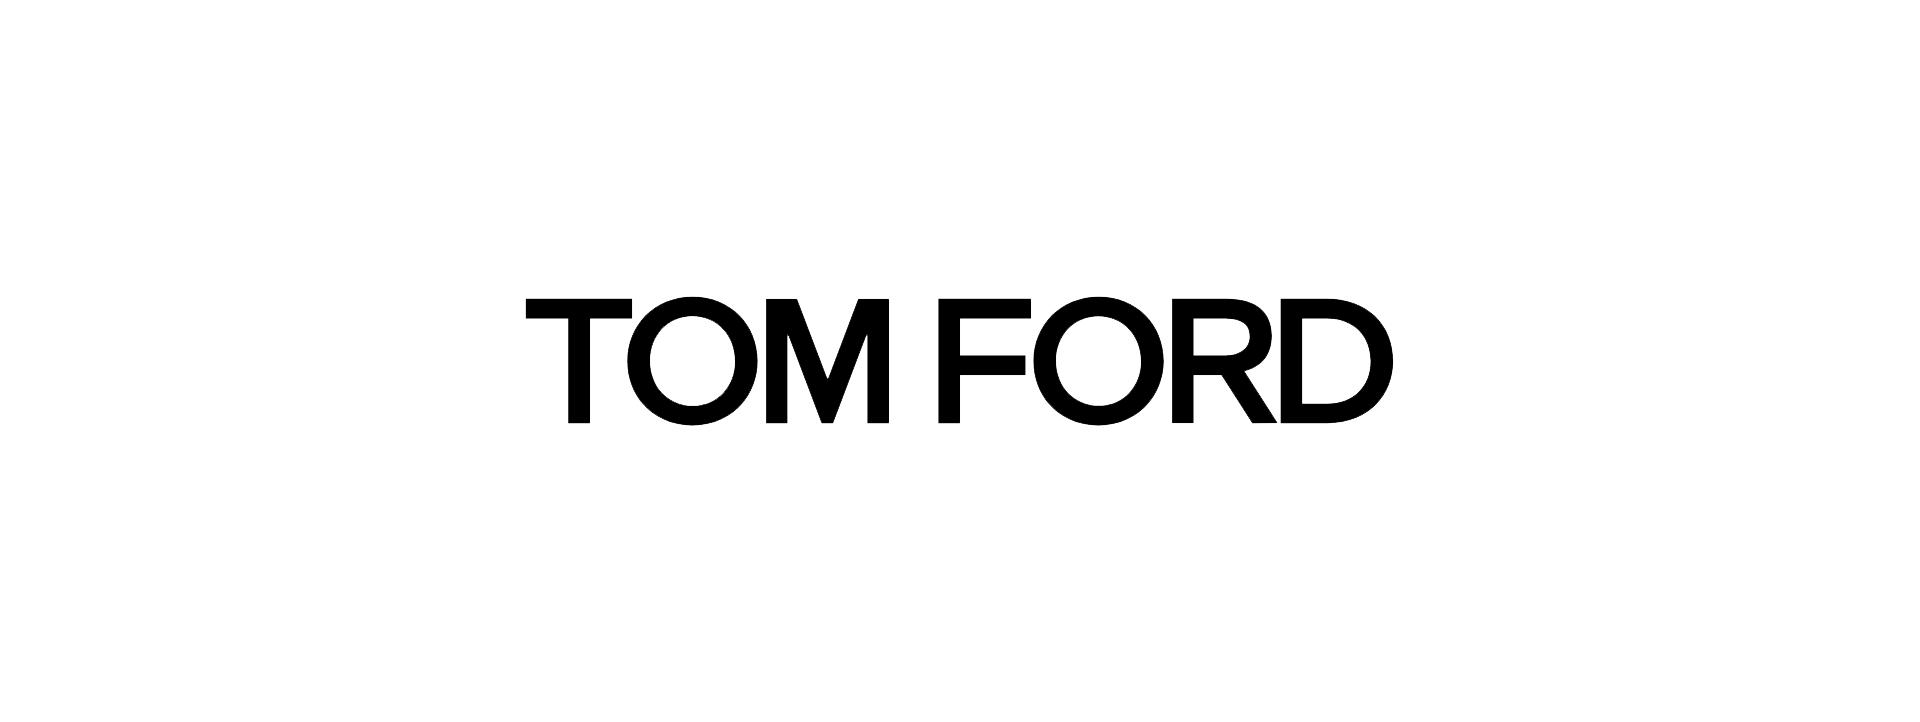 TomFord.png